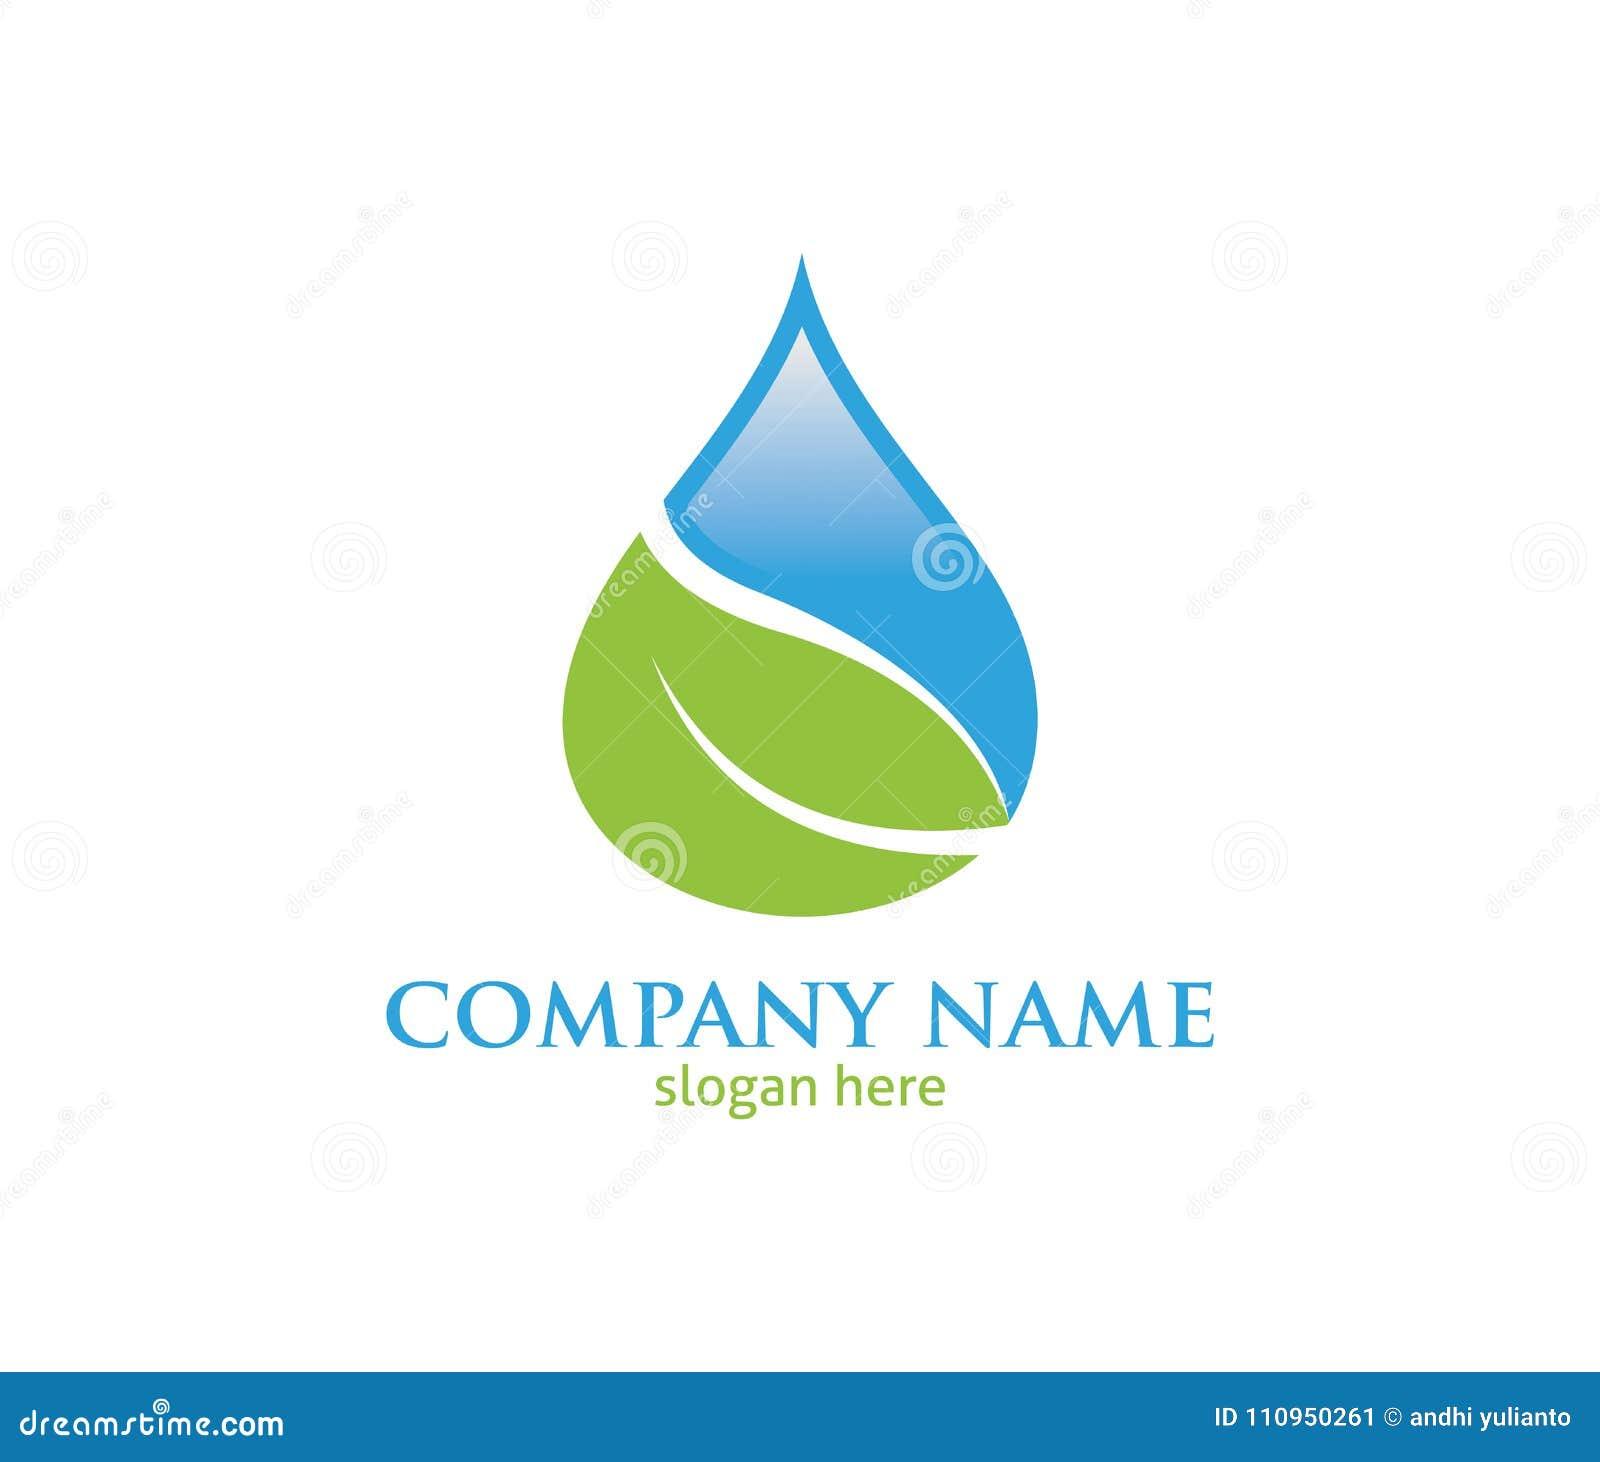 Water Drop Leaf Pure Source Vector Logo Design Stock Illustration